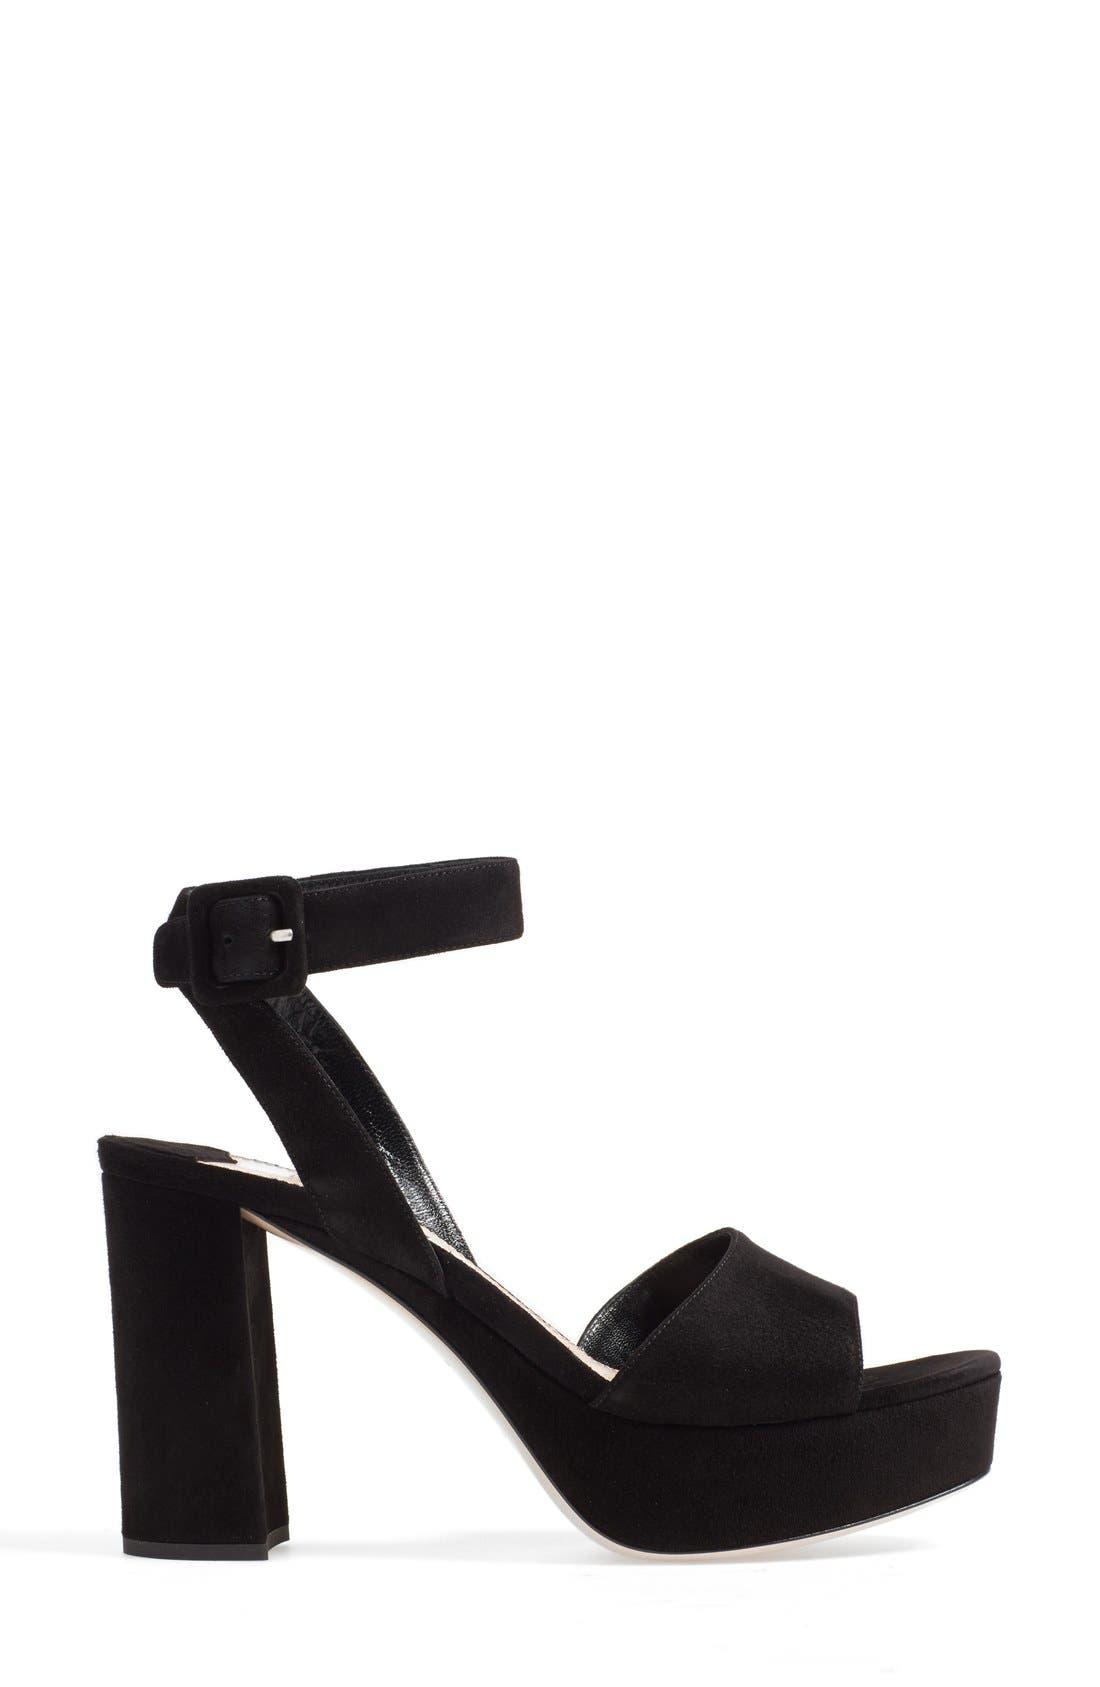 'Sandali' Ankle Strap Sandal,                             Alternate thumbnail 4, color,                             Black